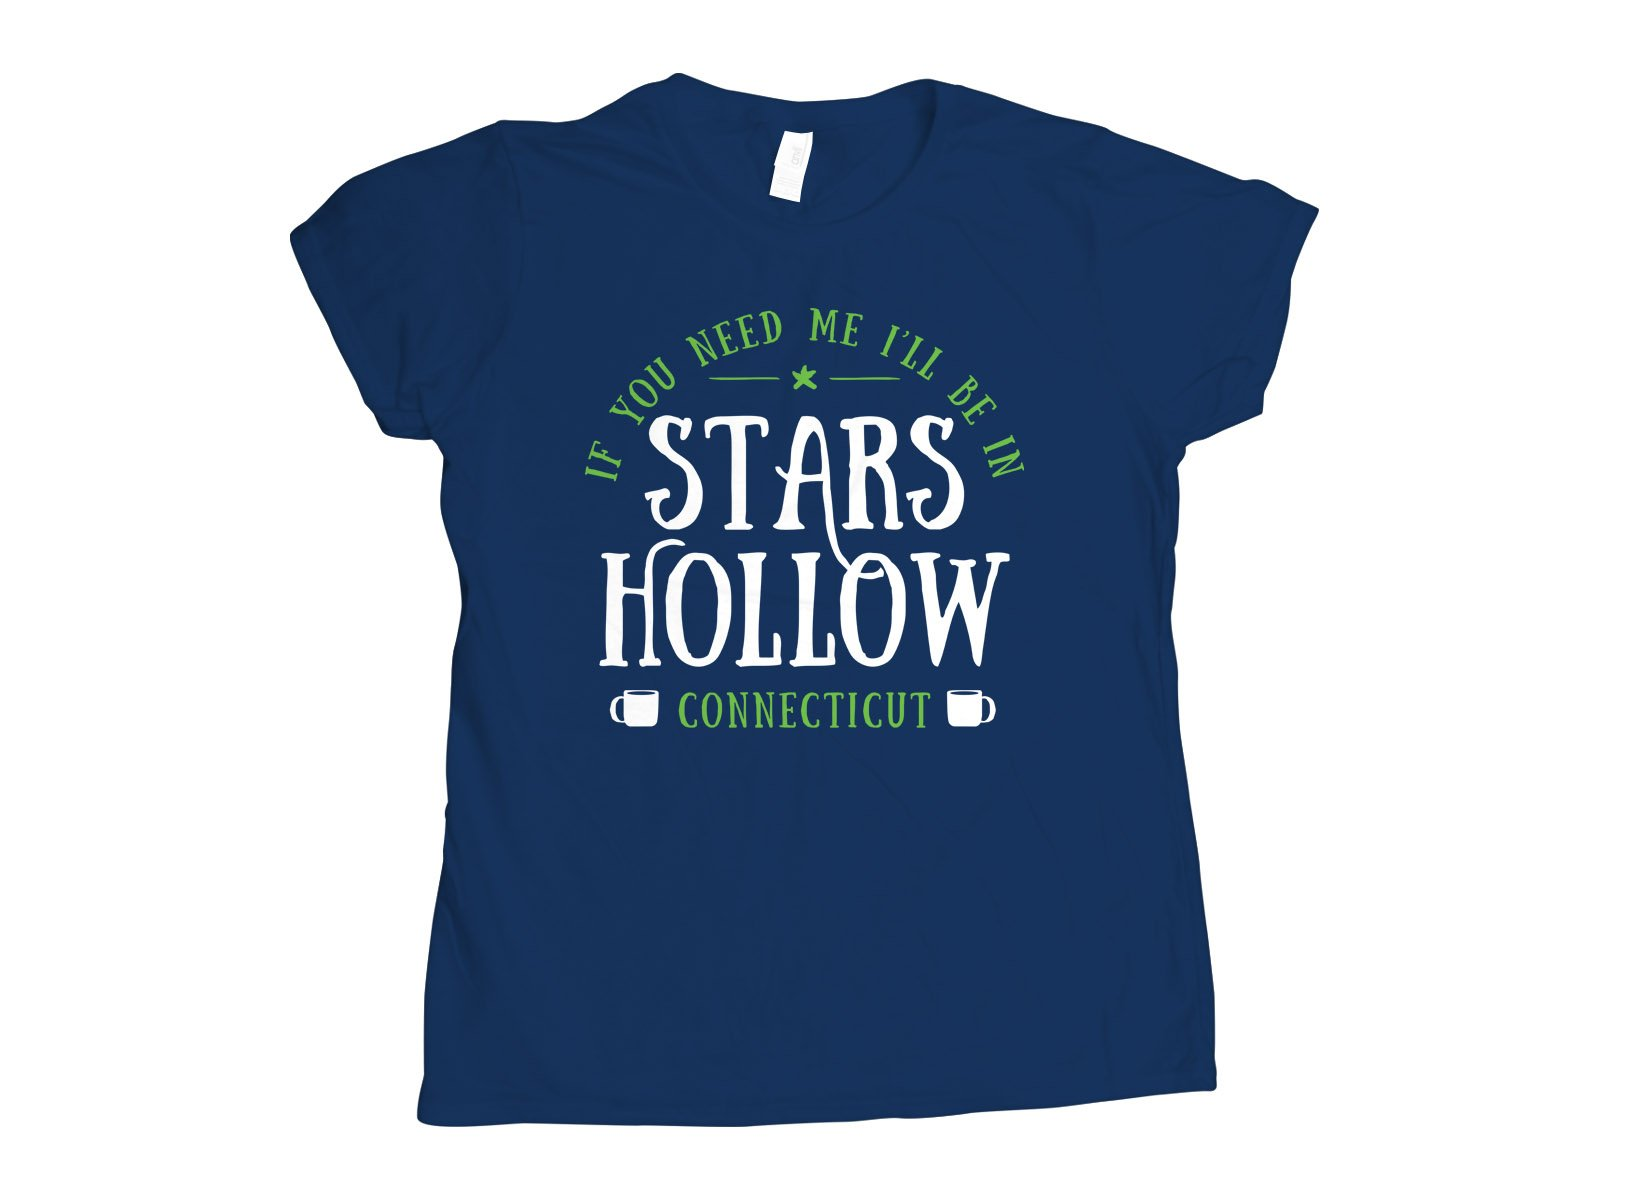 Stars Hollow on Womens T-Shirt